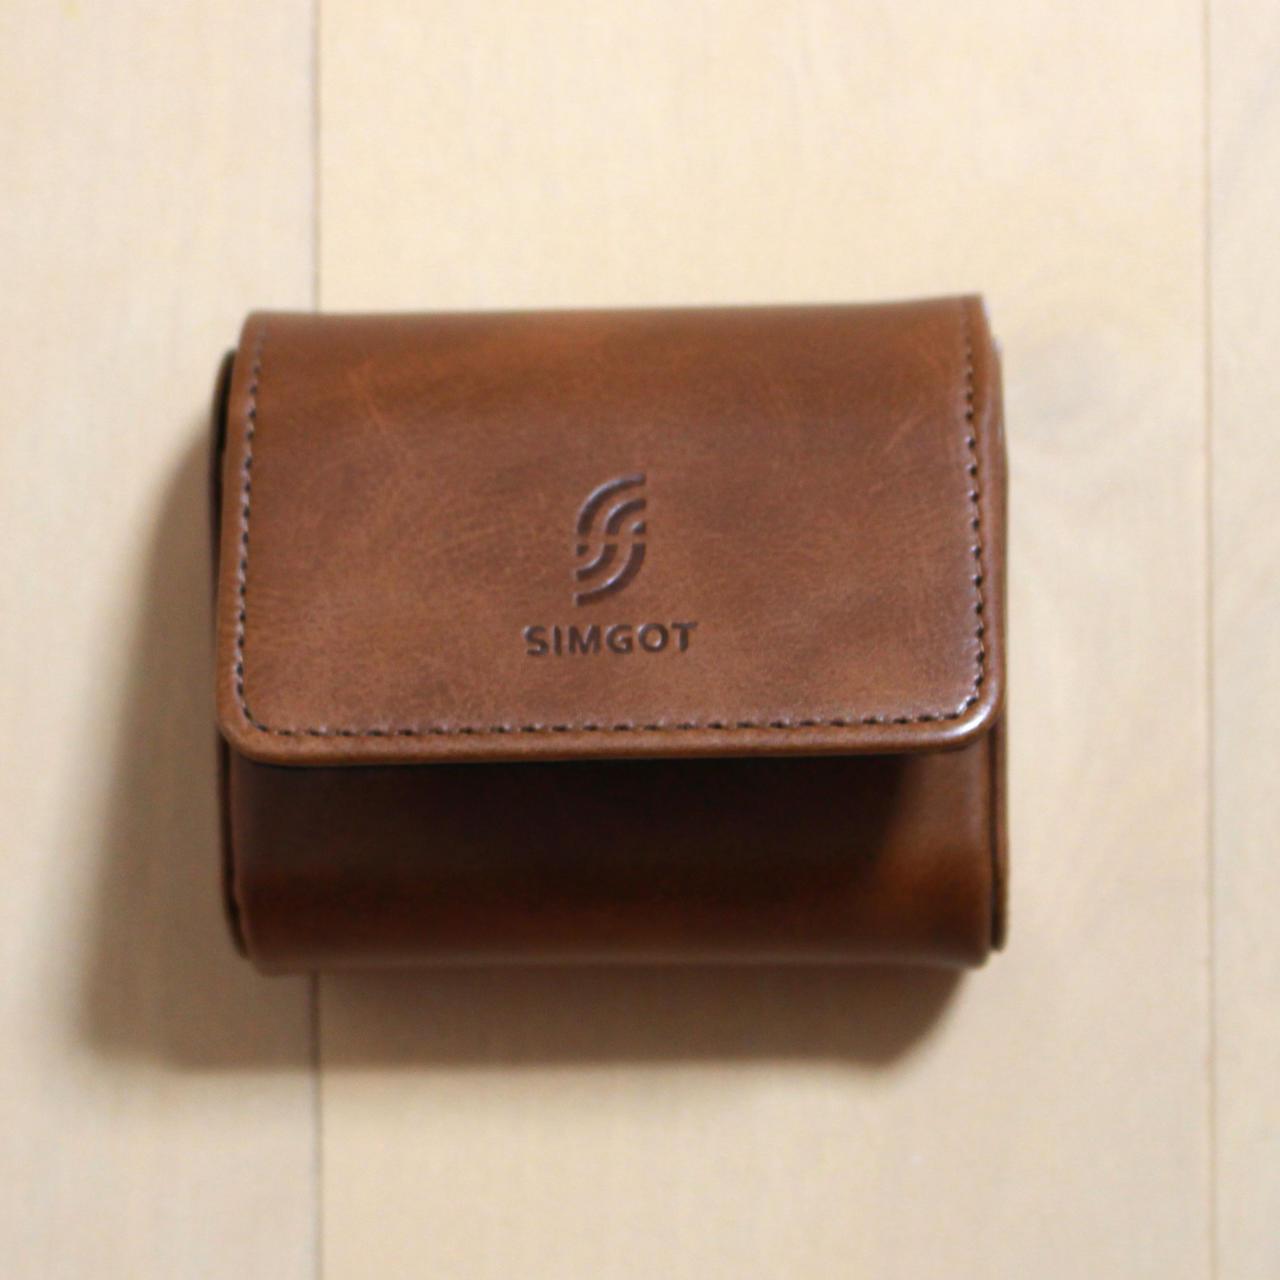 SIMGOT EM2はマグネット留めのケースが付属